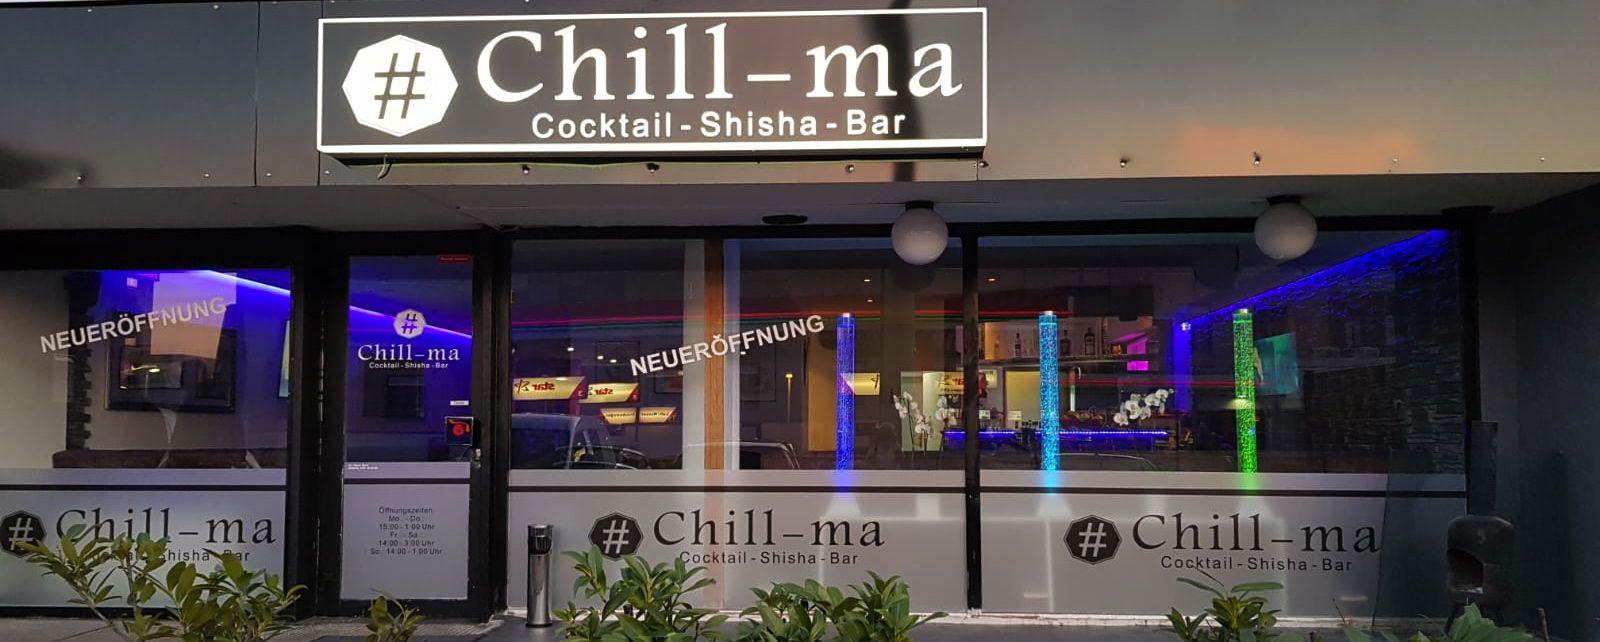 # CHILL−ma, die neue Cocktail − Shisha − Bar in Langenfeld